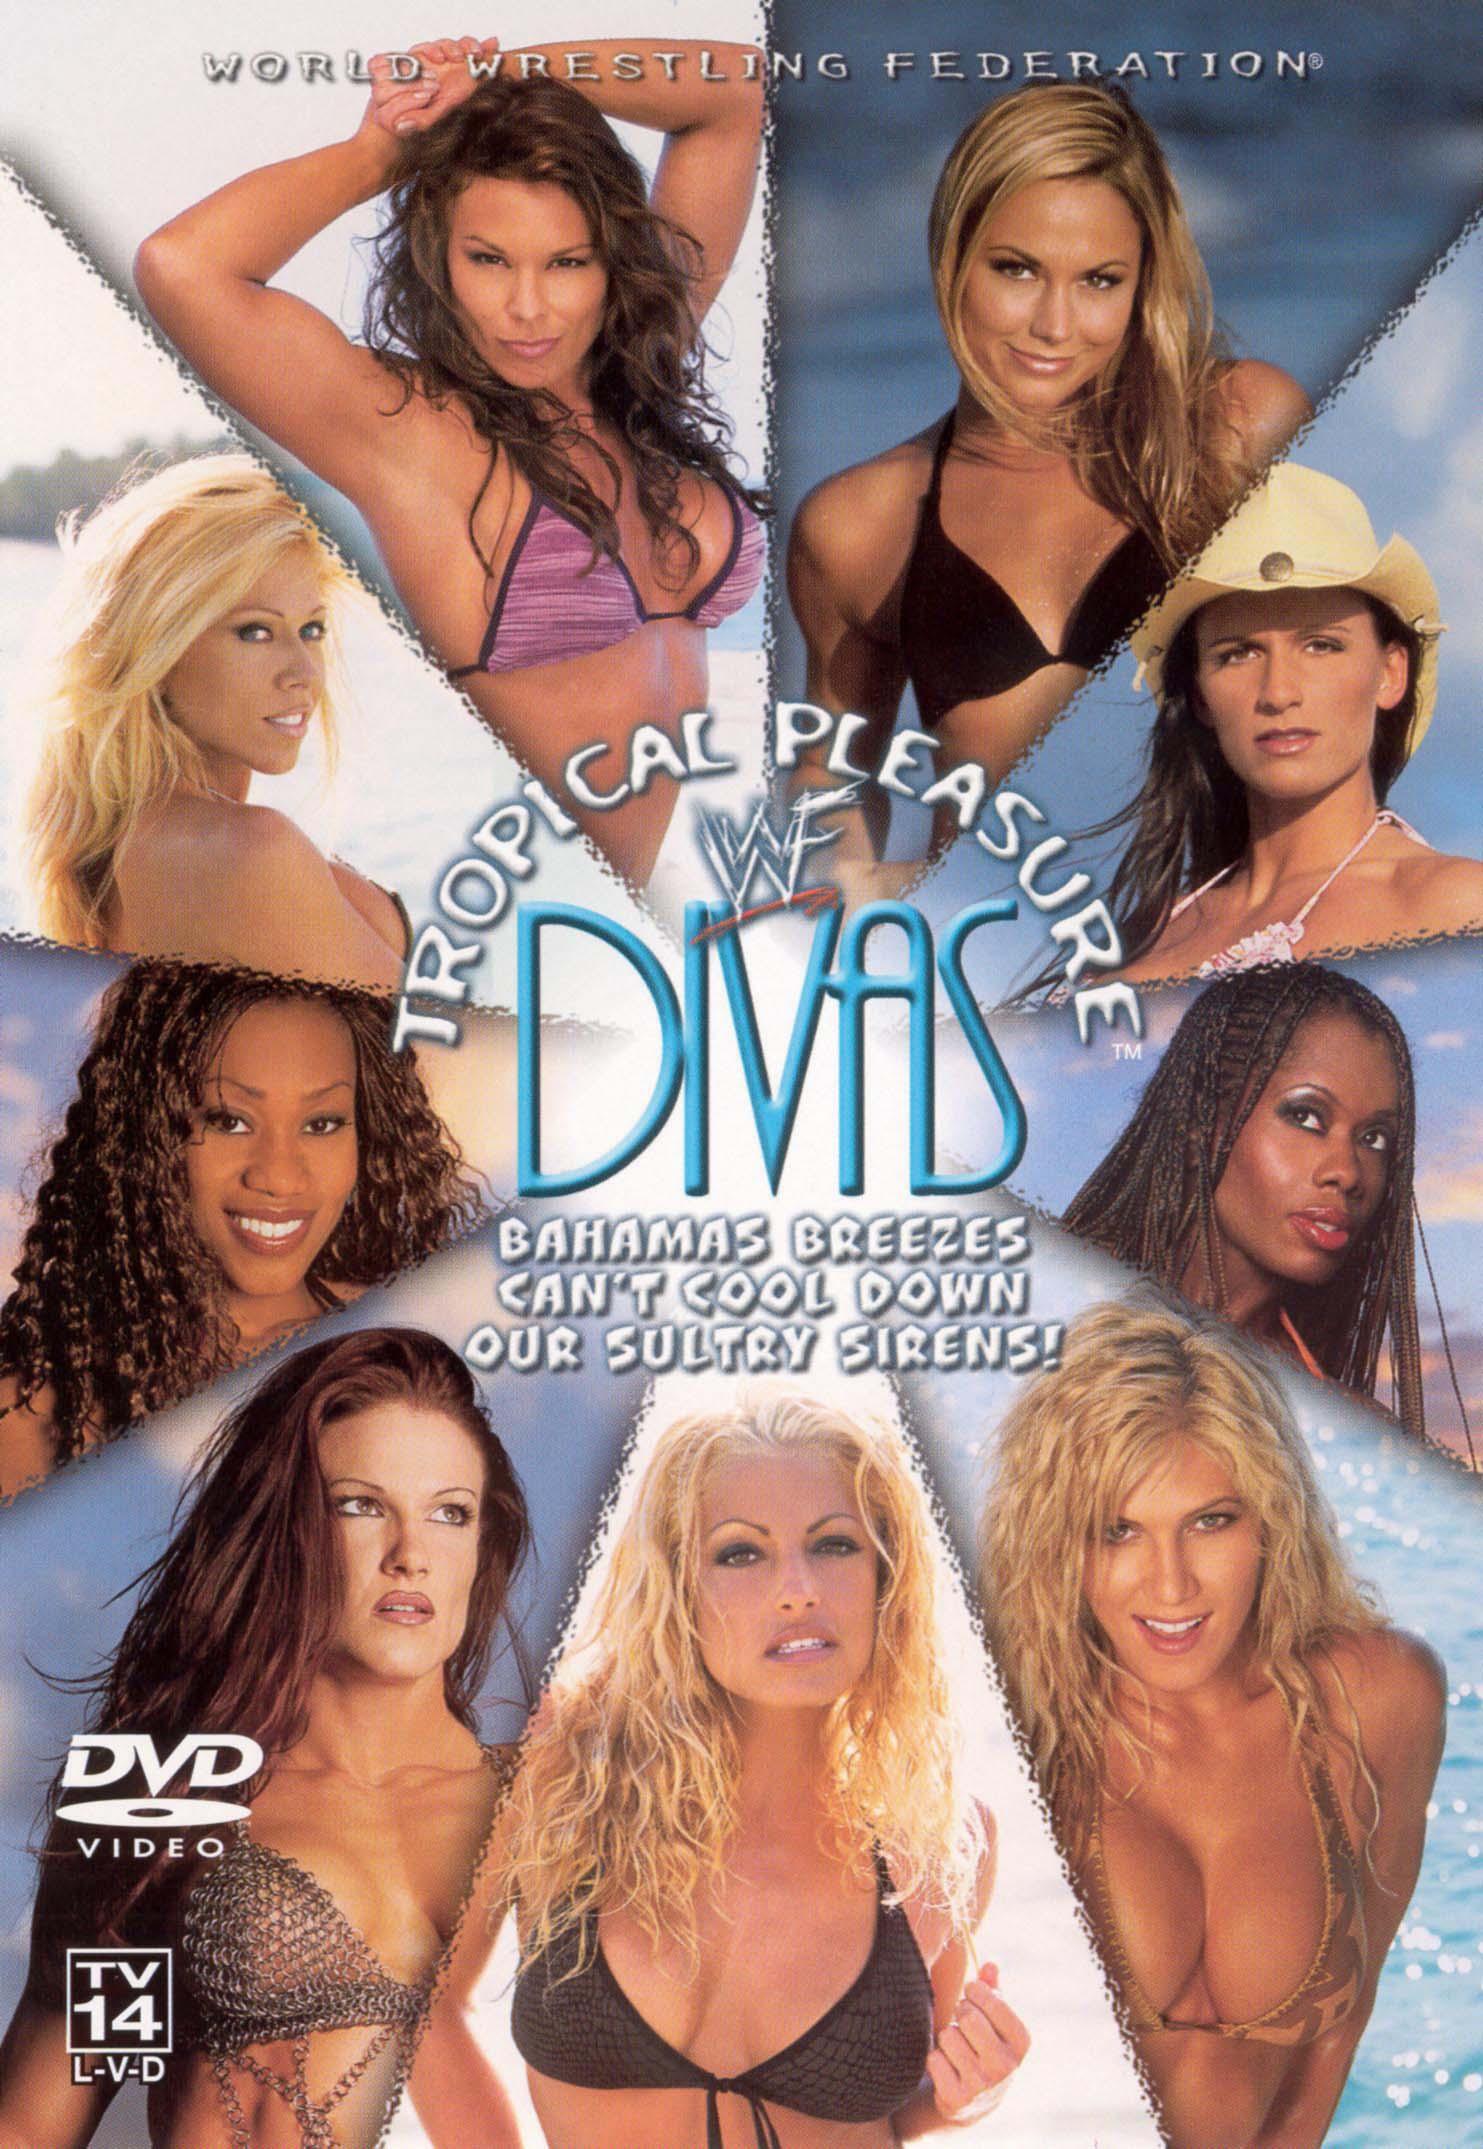 WWF: Divas - Tropical Pleasures